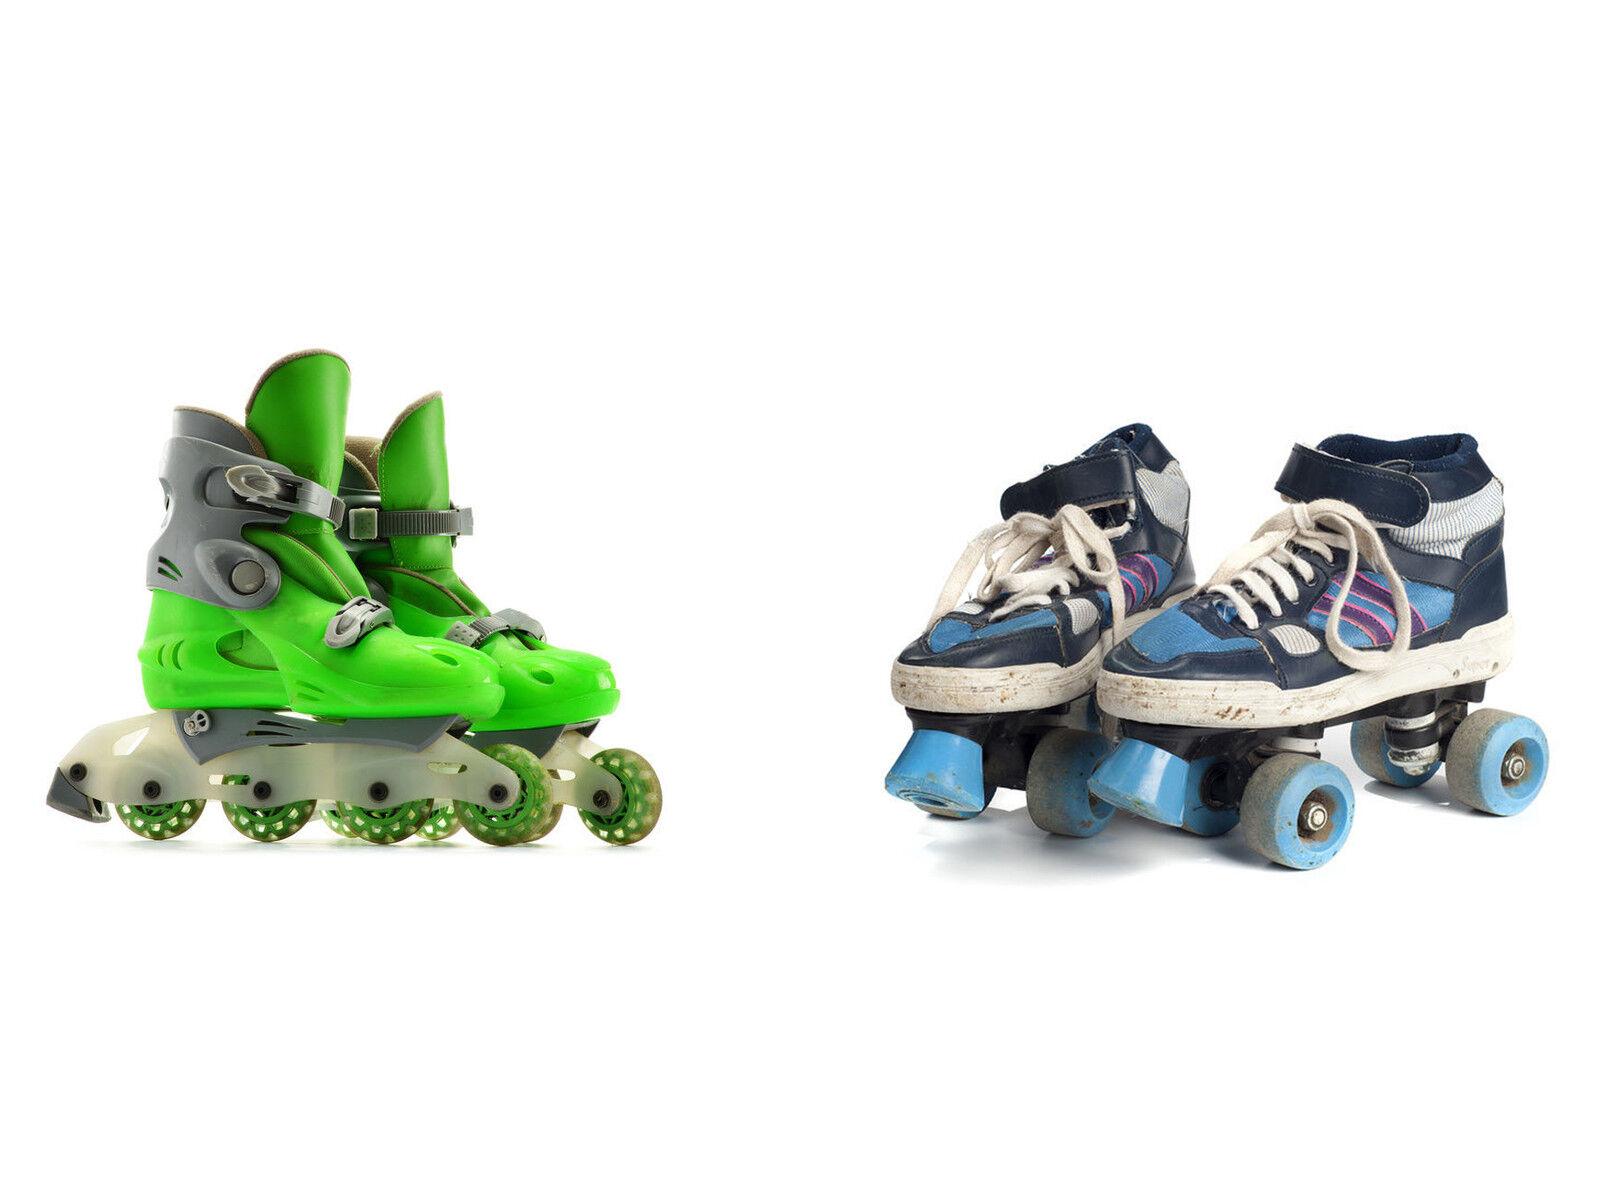 Roller shoes london - Roller Skates Vs Inline Skates